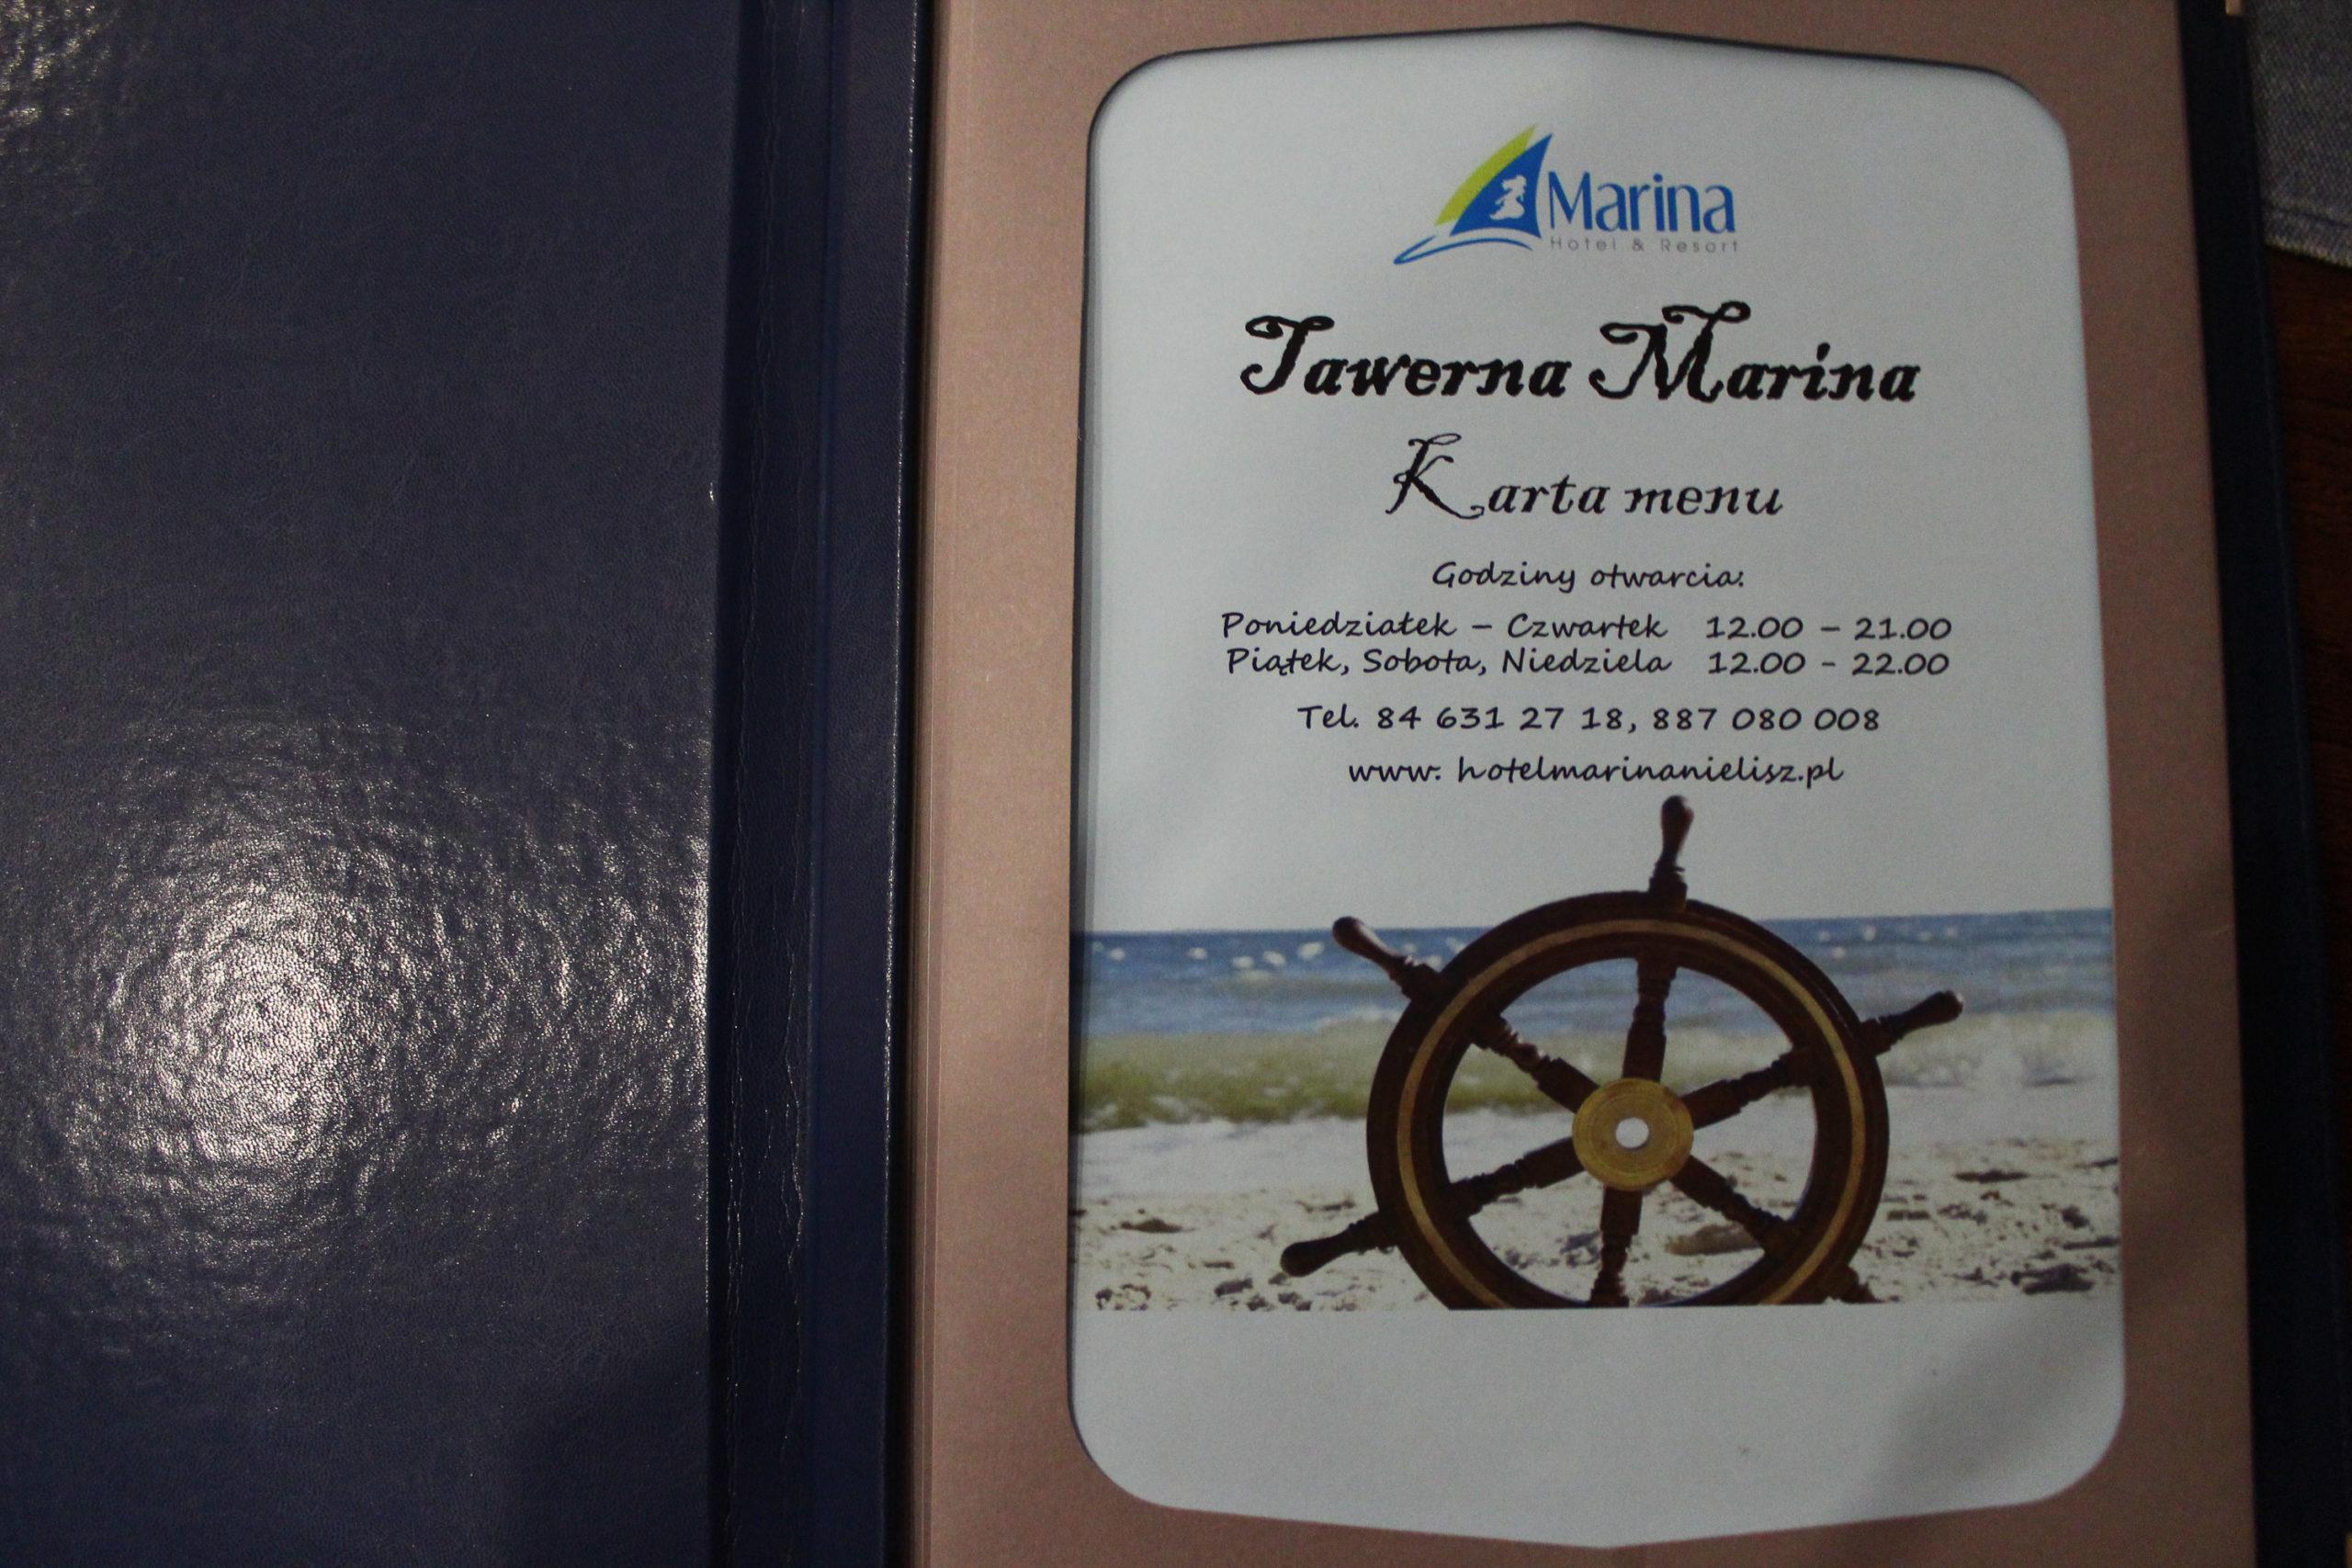 Tawerna Marina karta Menu